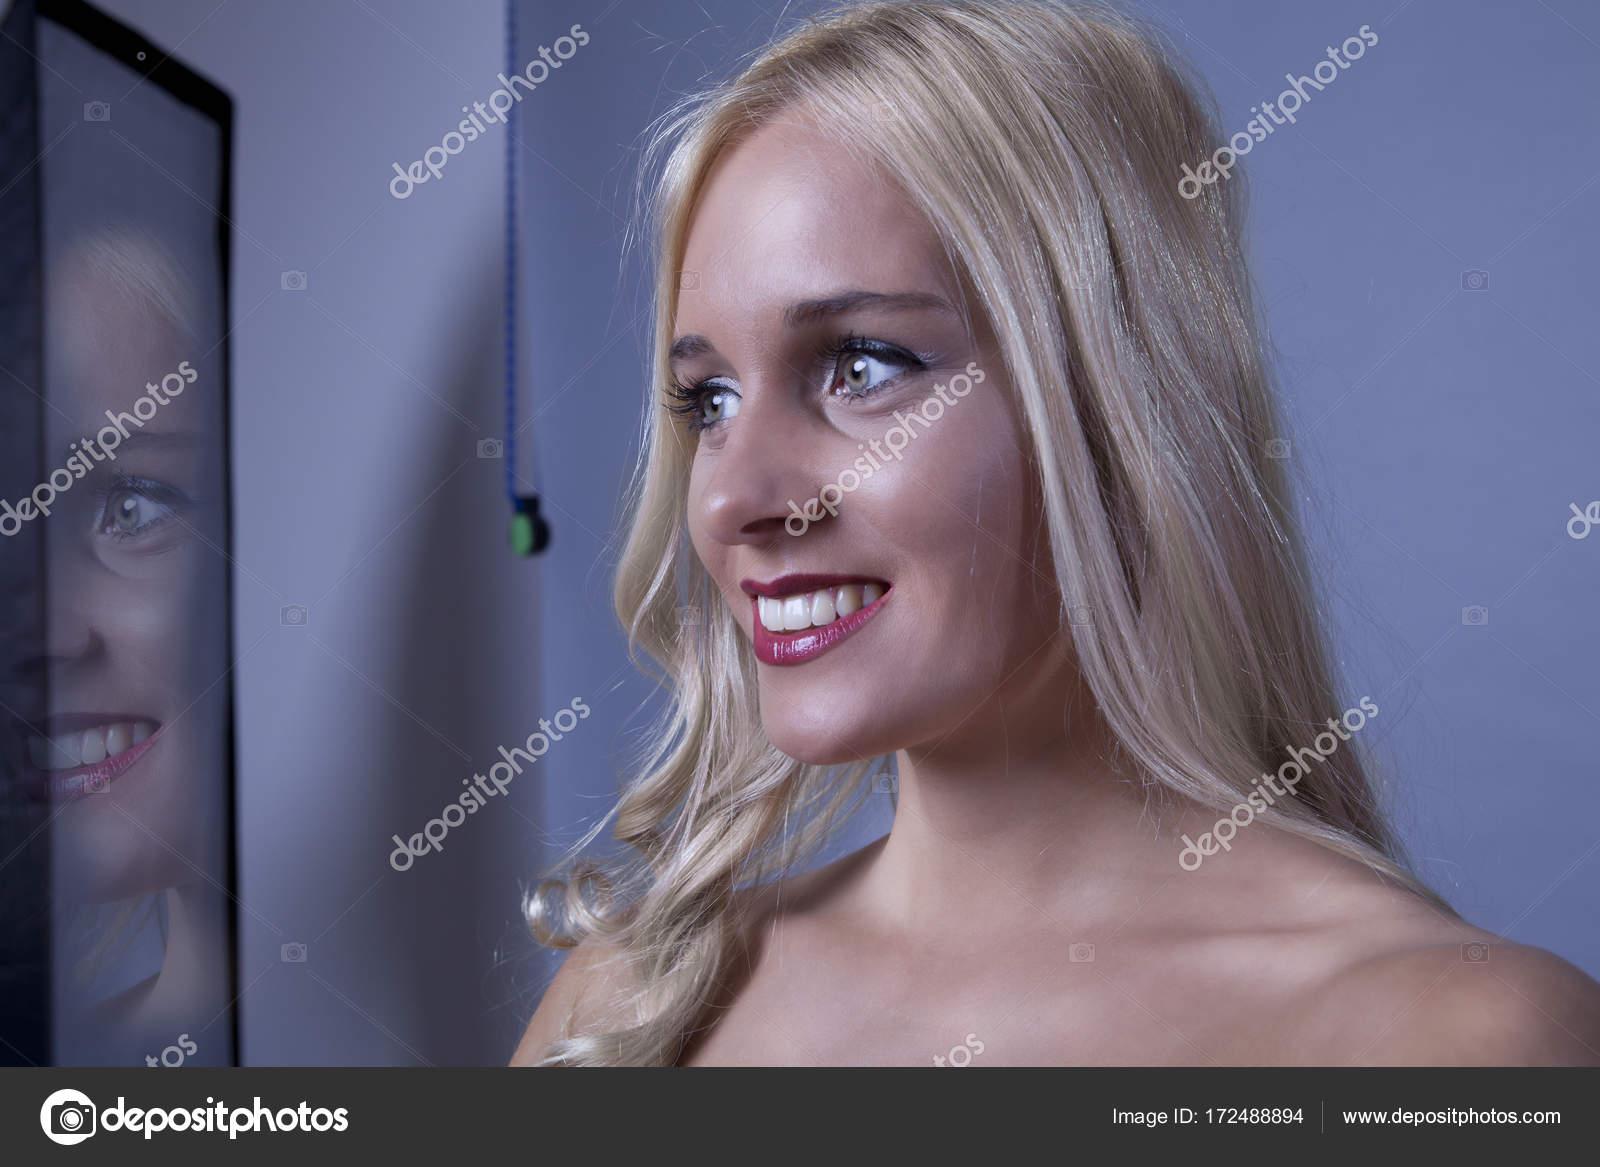 Знакомства веб камера знакомства в п г т веселом